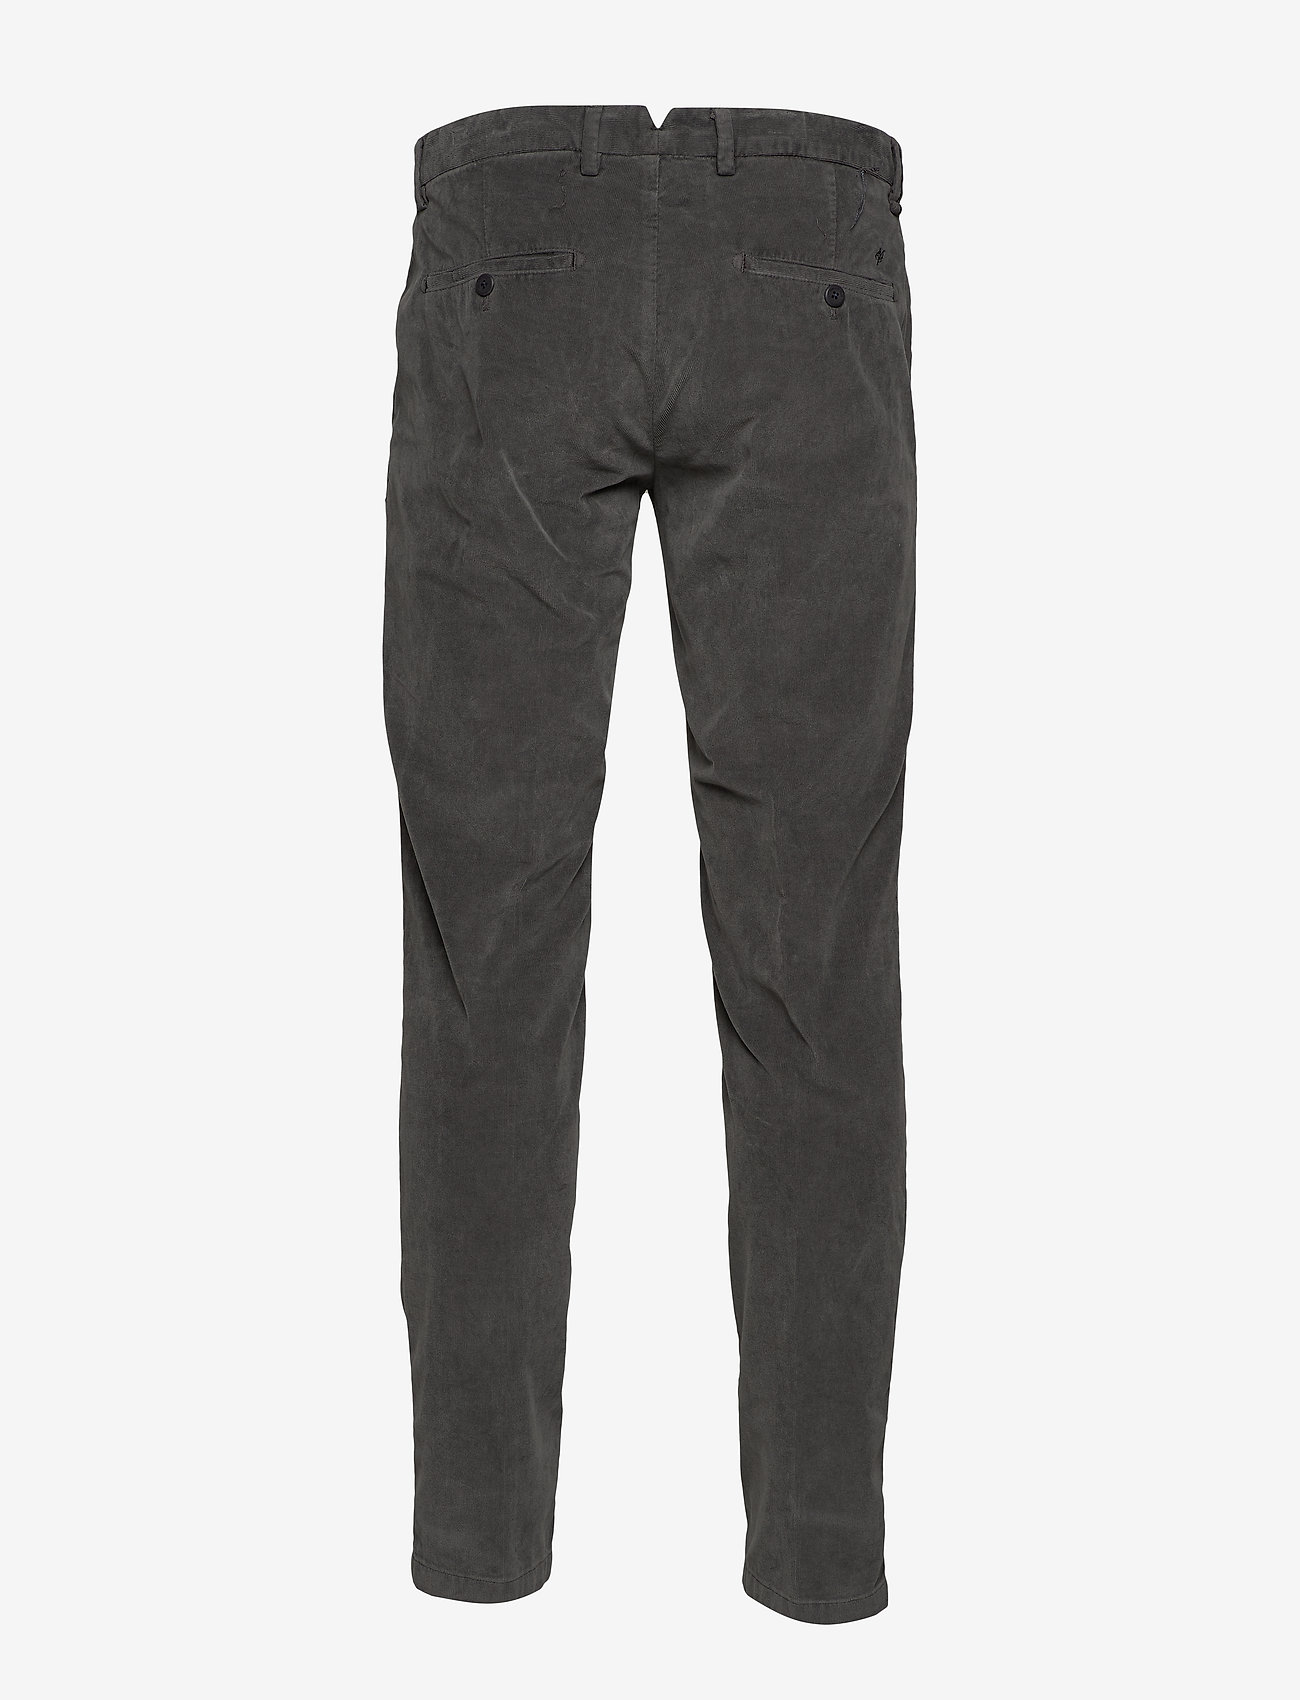 Woven Pants (Gray Pinstripe) - Marc O'Polo OFh1RU